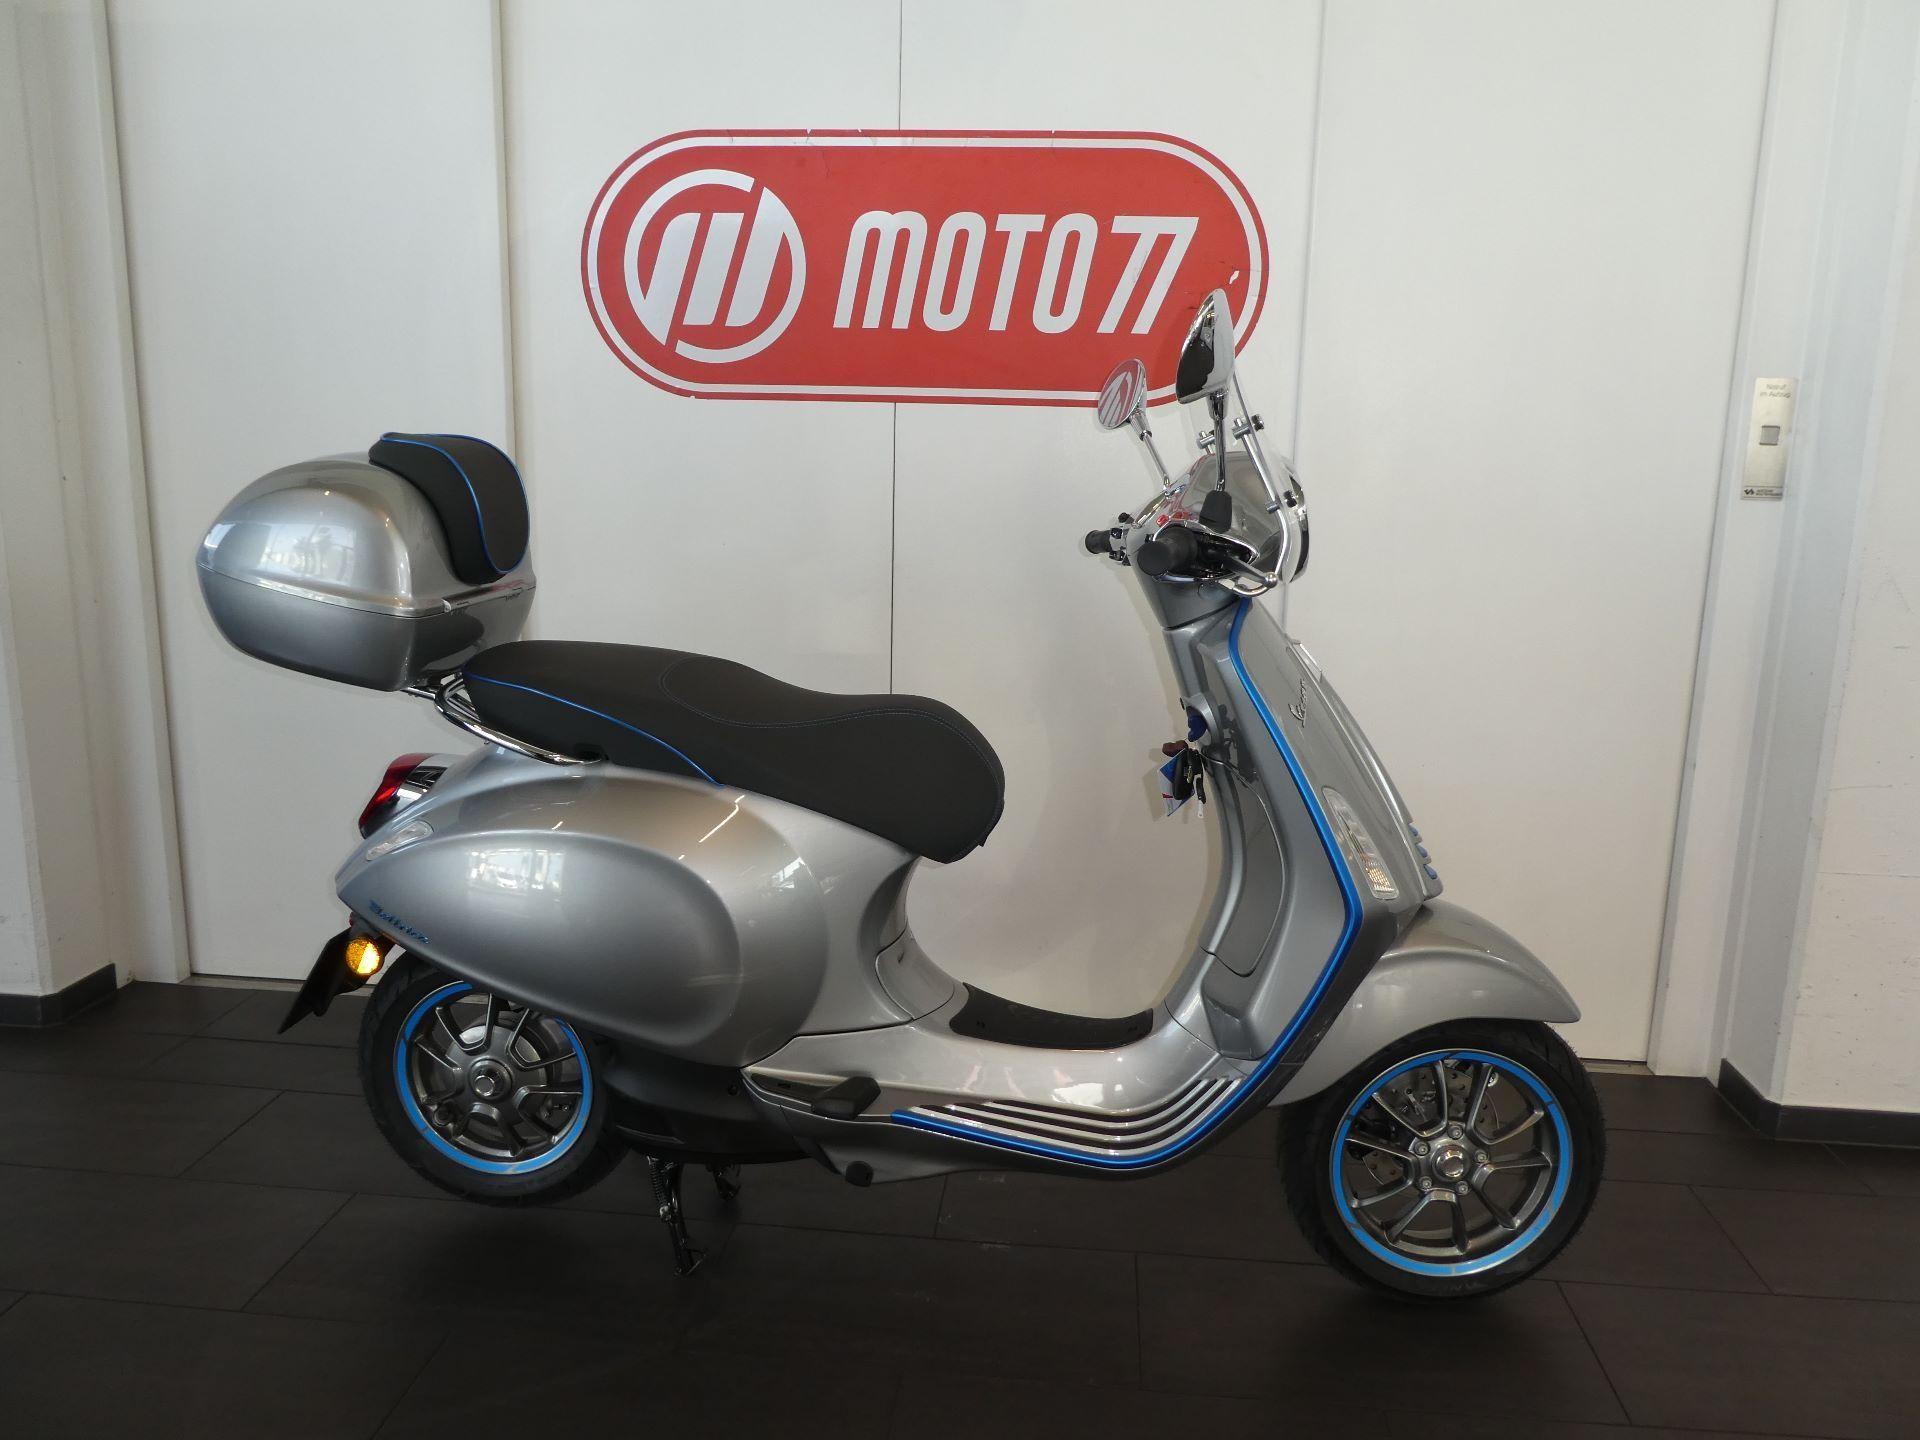 Motorrad Mieten & Roller Mieten PIAGGIO Vespa Elettrica